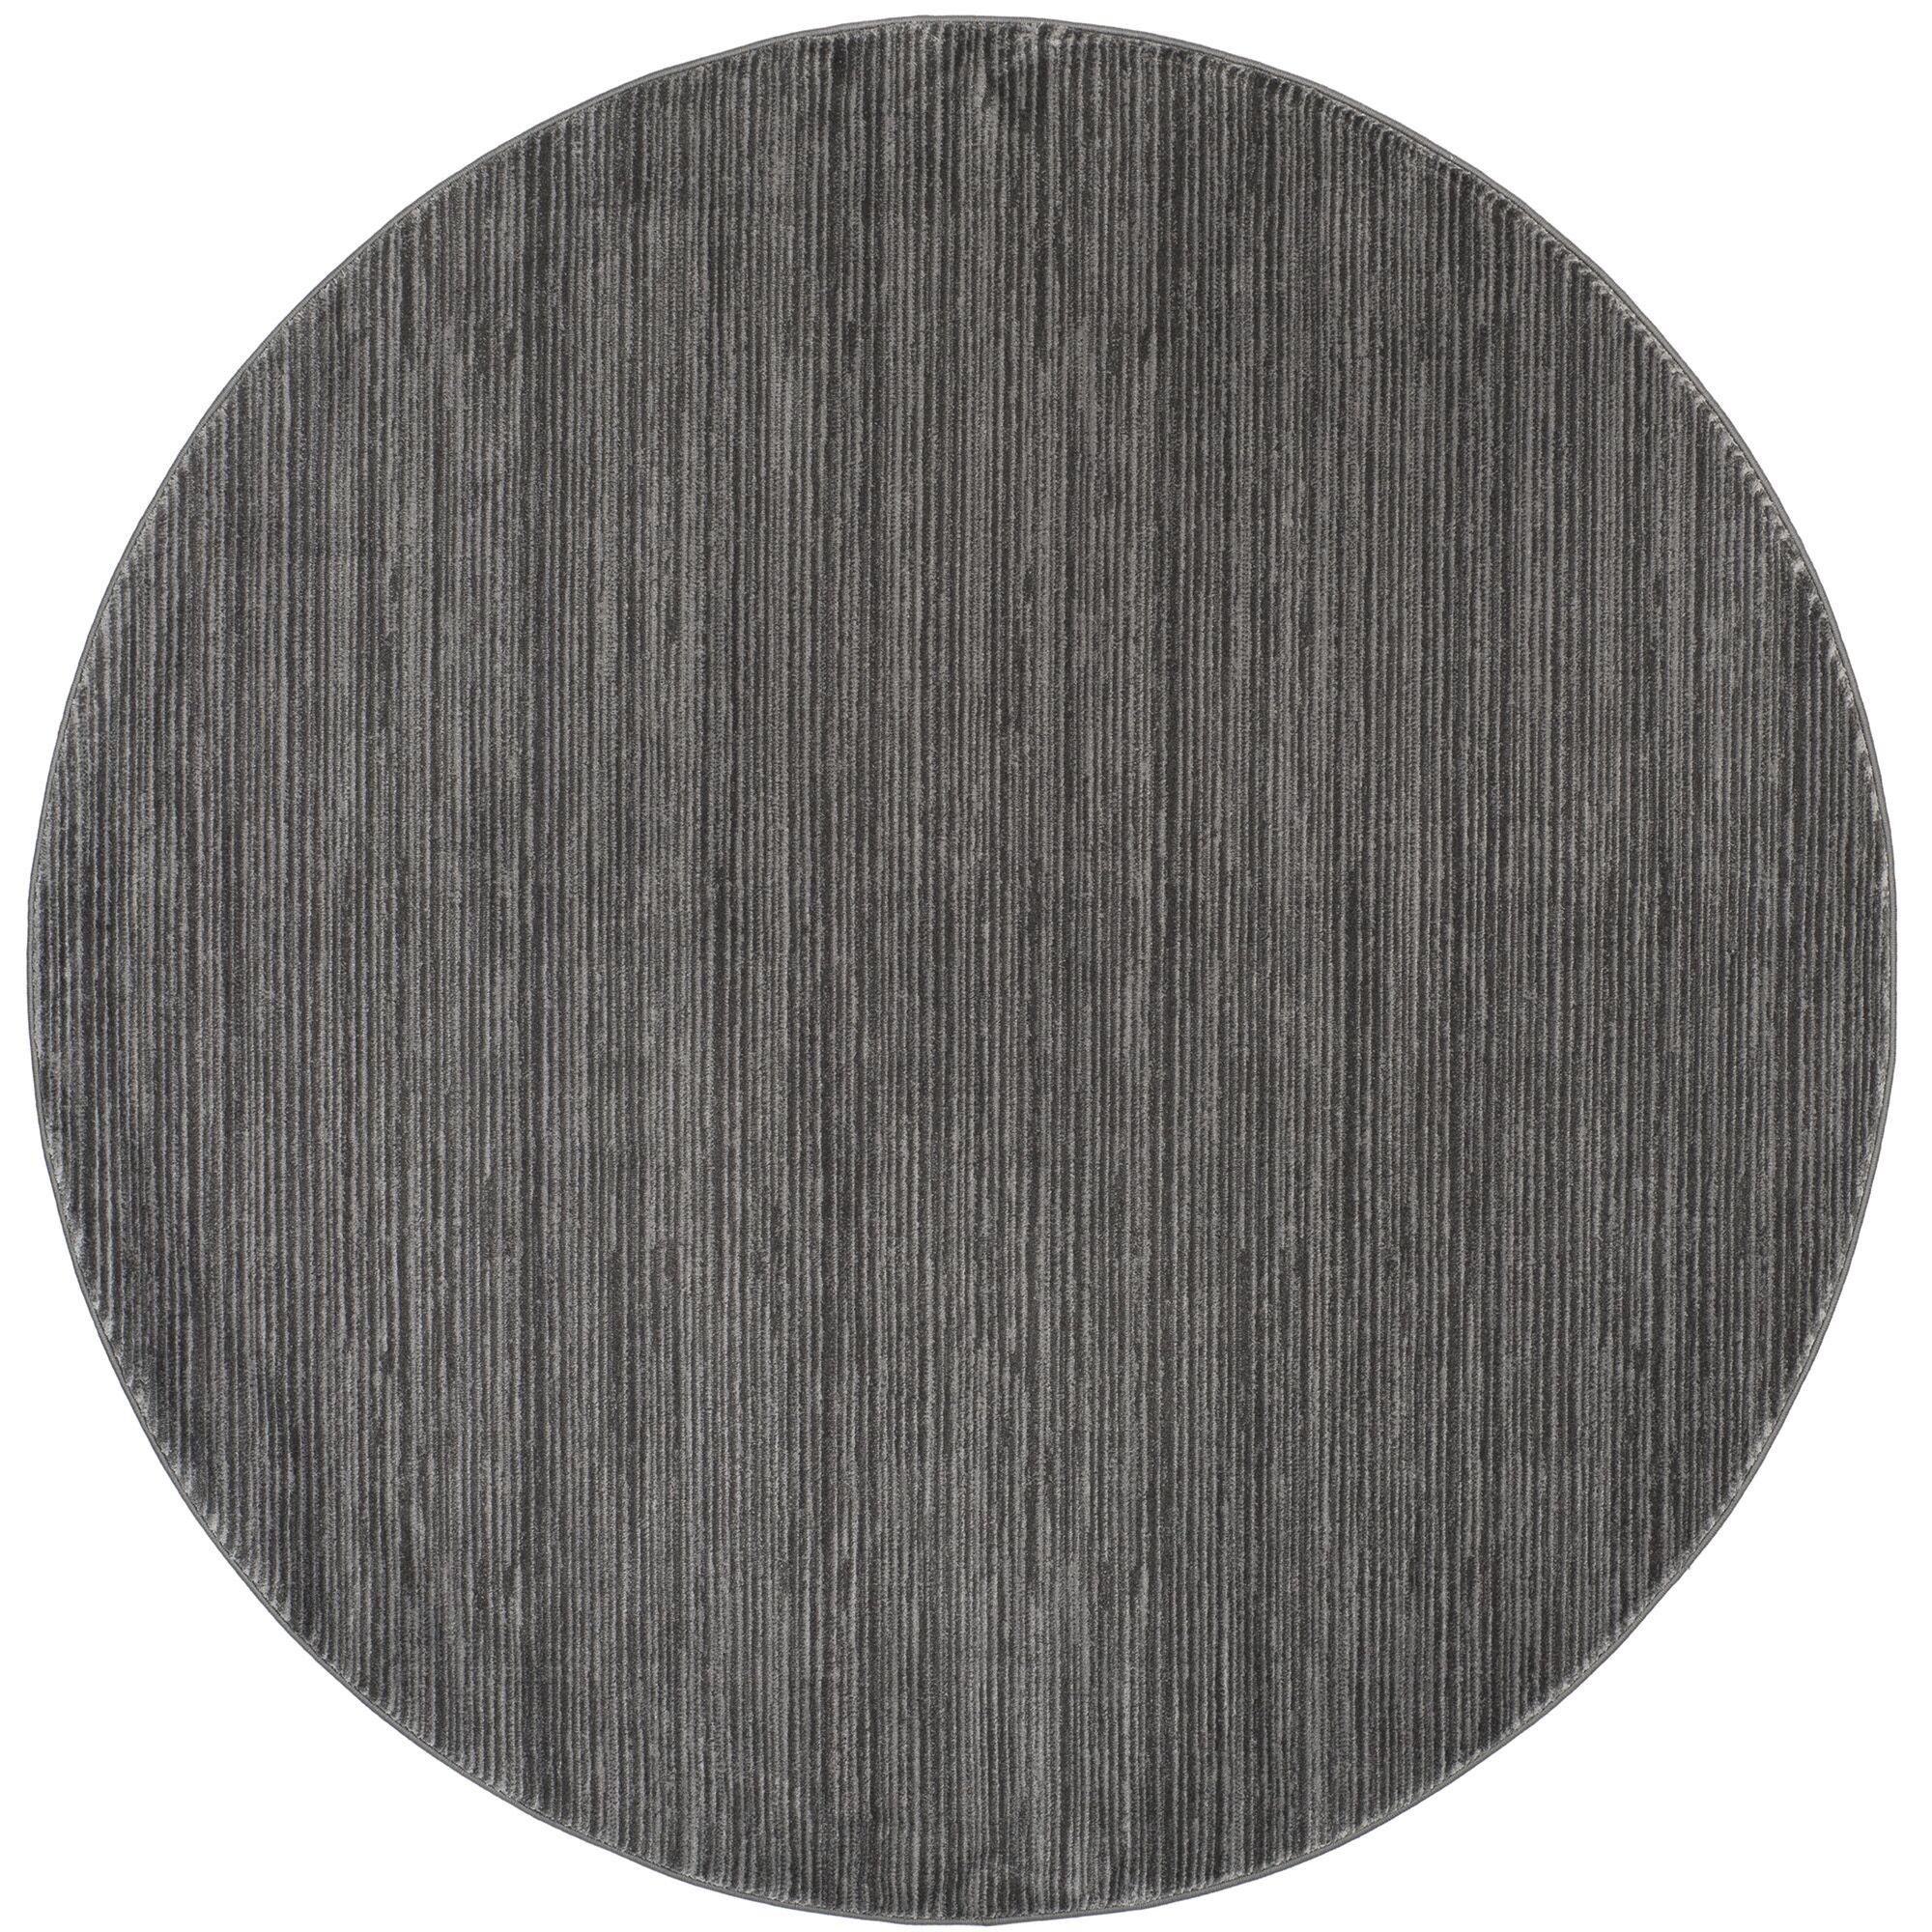 Harloe Gray Area Rug Rug Size: Round 6'7